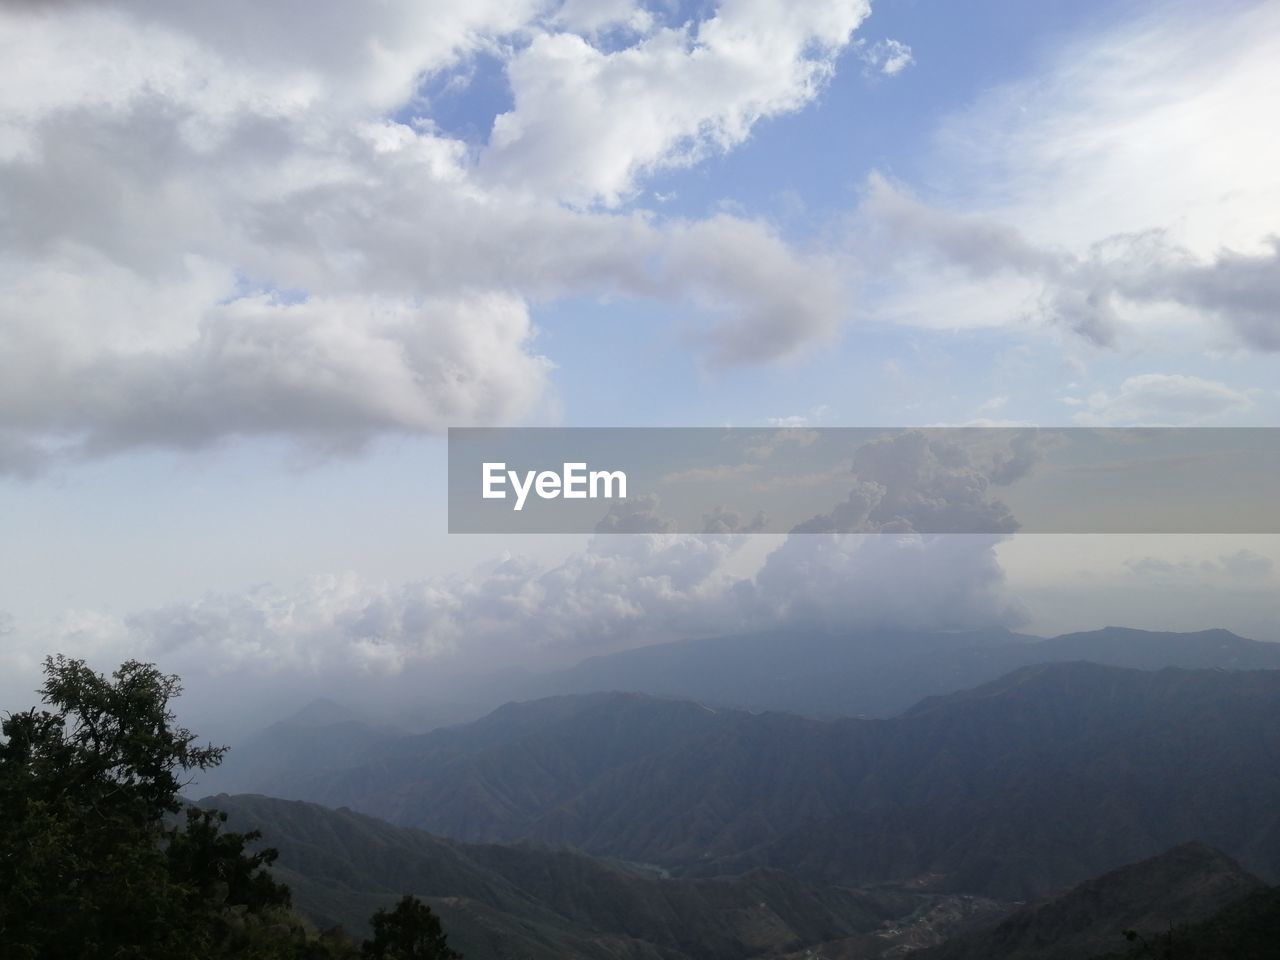 mountain, cloud - sky, sky, scenics - nature, beauty in nature, tranquility, tranquil scene, mountain range, non-urban scene, nature, idyllic, environment, tree, day, no people, landscape, plant, remote, outdoors, mountain peak